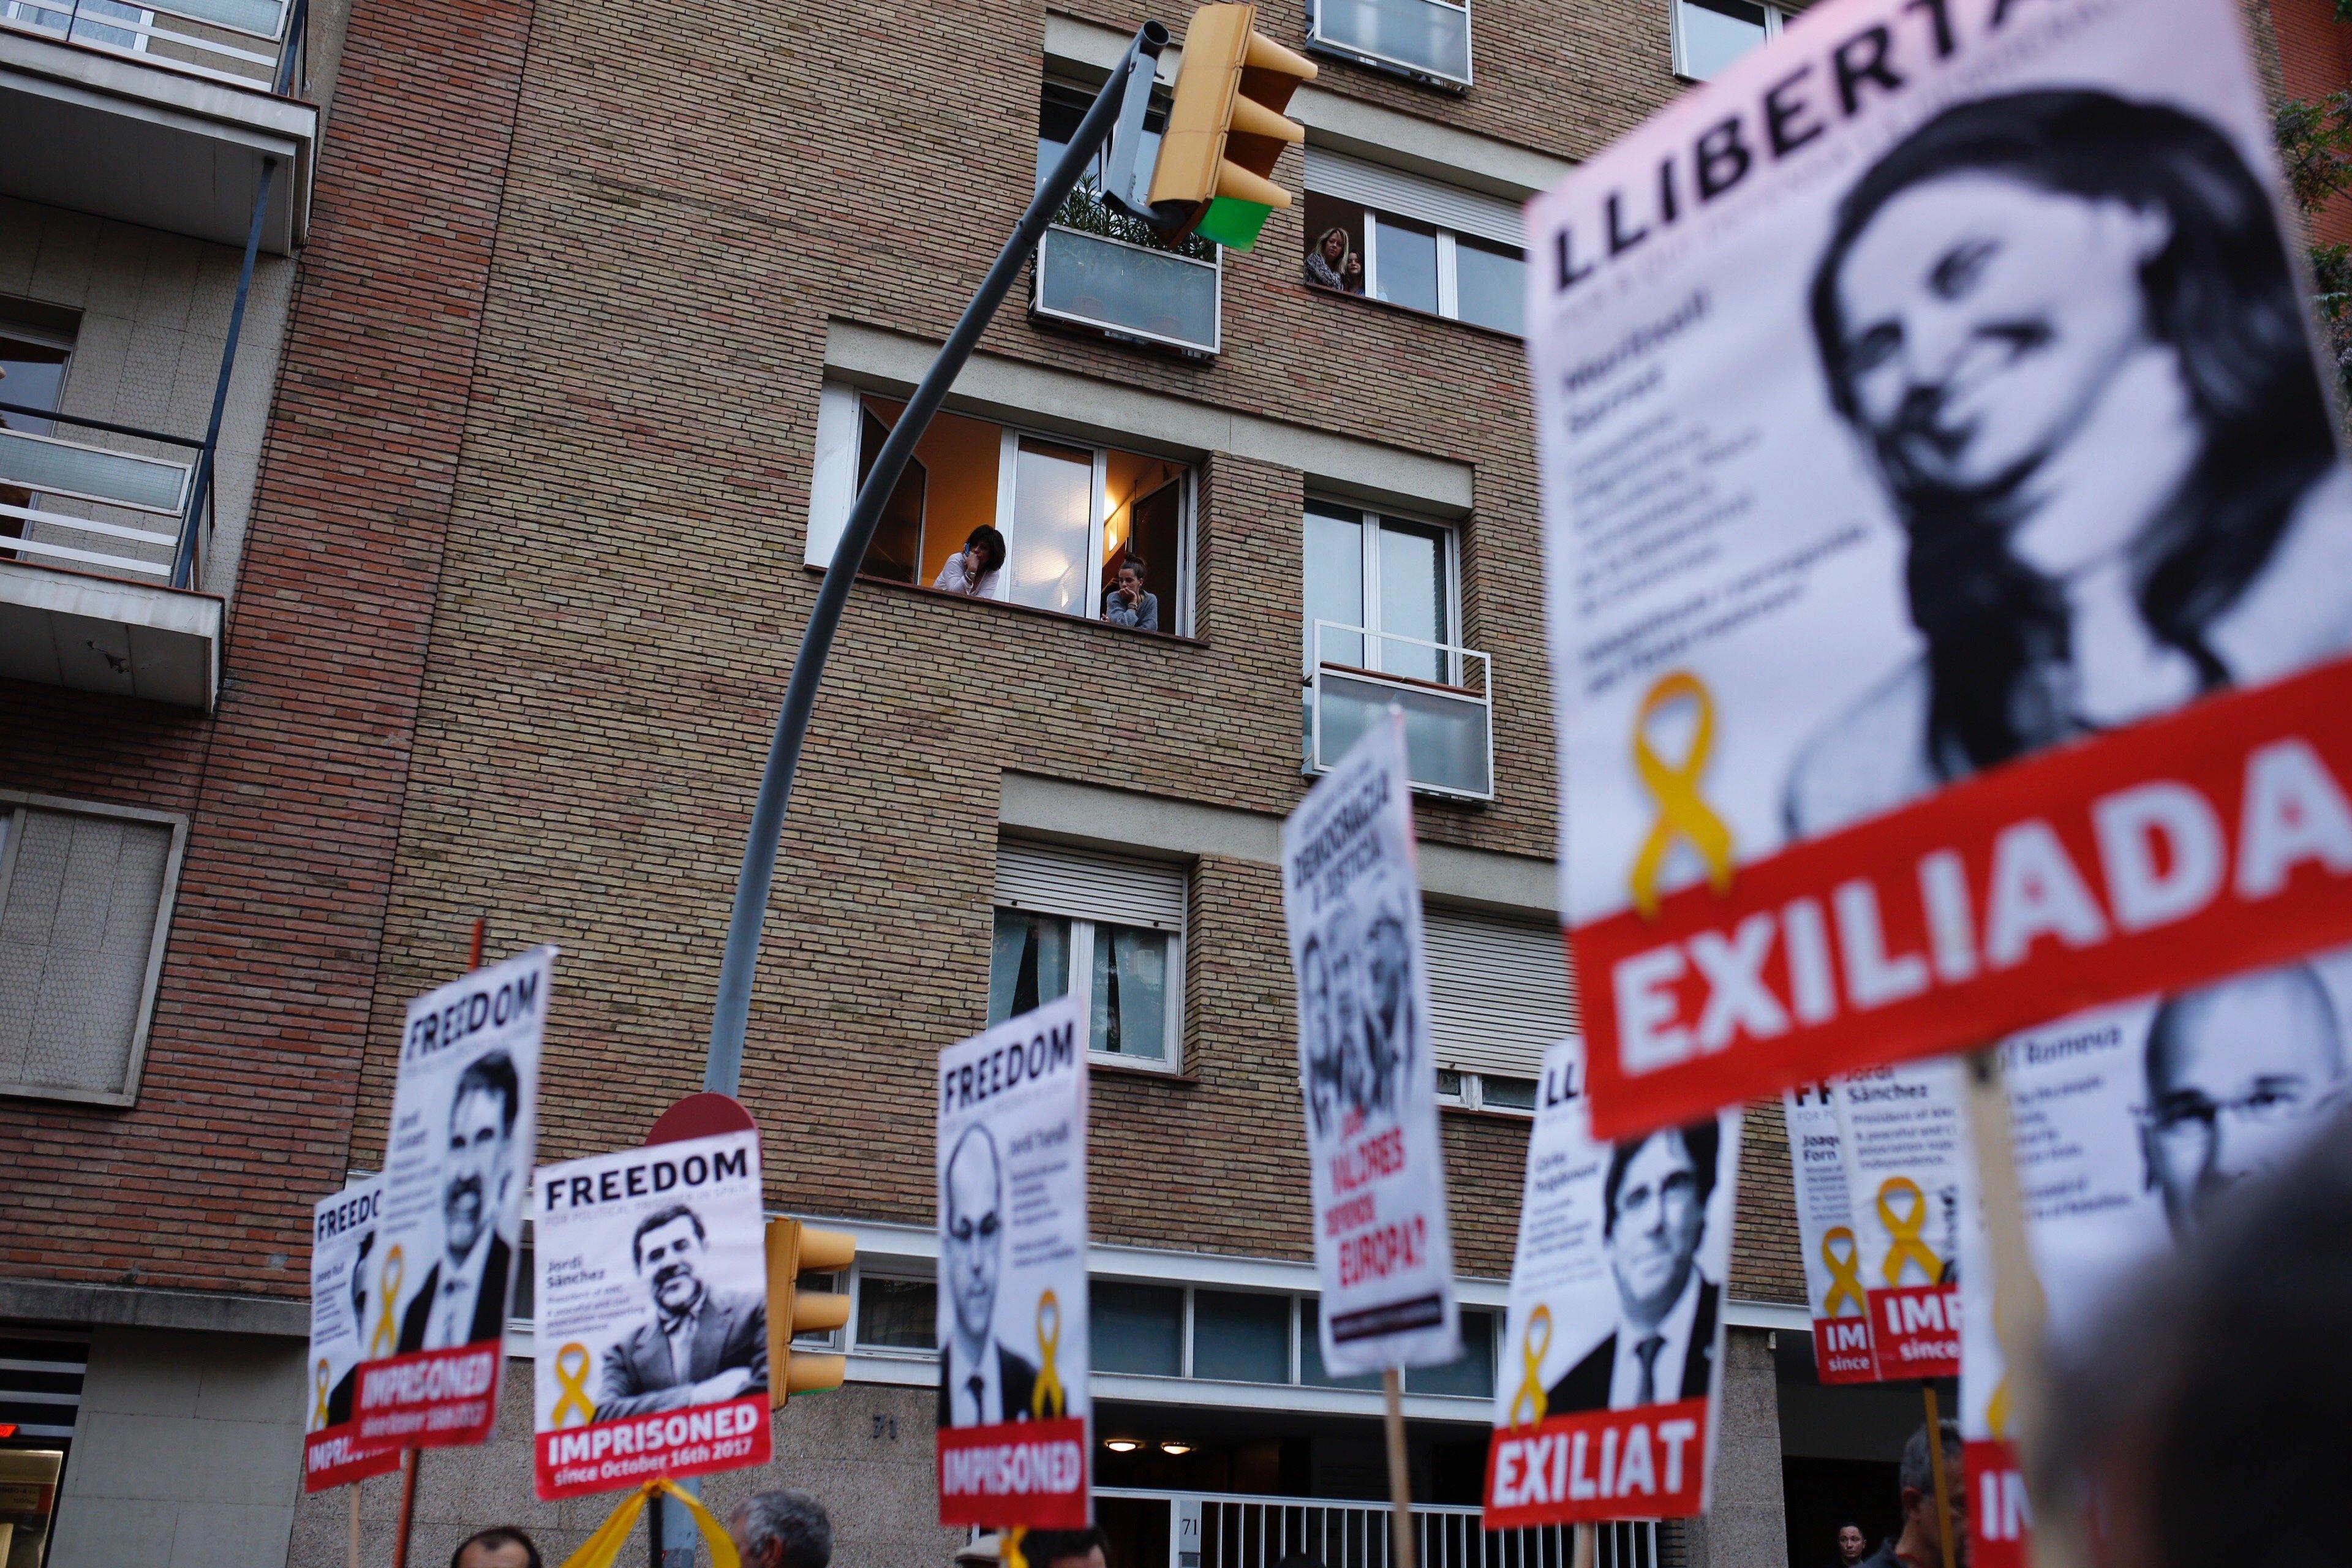 manifestacio contra retirada llaços grocs ensenyament - sergi alcazar